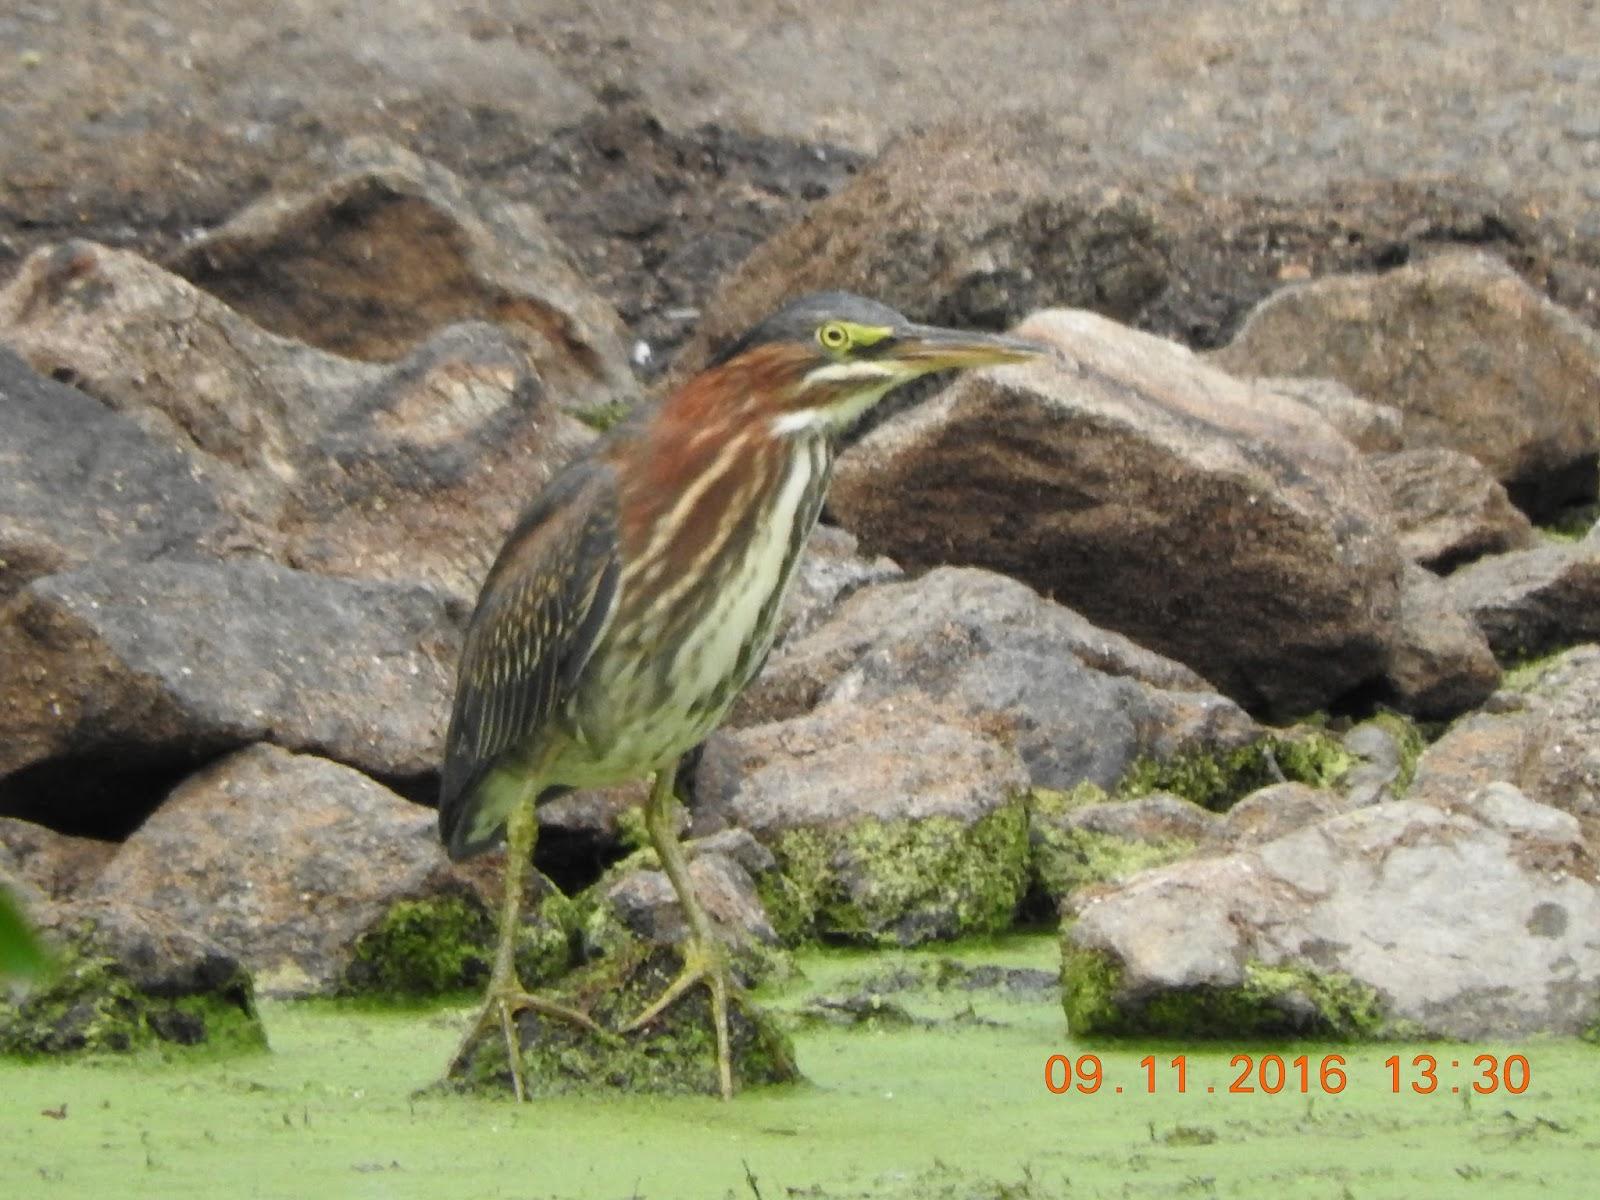 Steve's Birds: Broad-winged Hawk, Viceroy, Eisenhower, 9/11/16